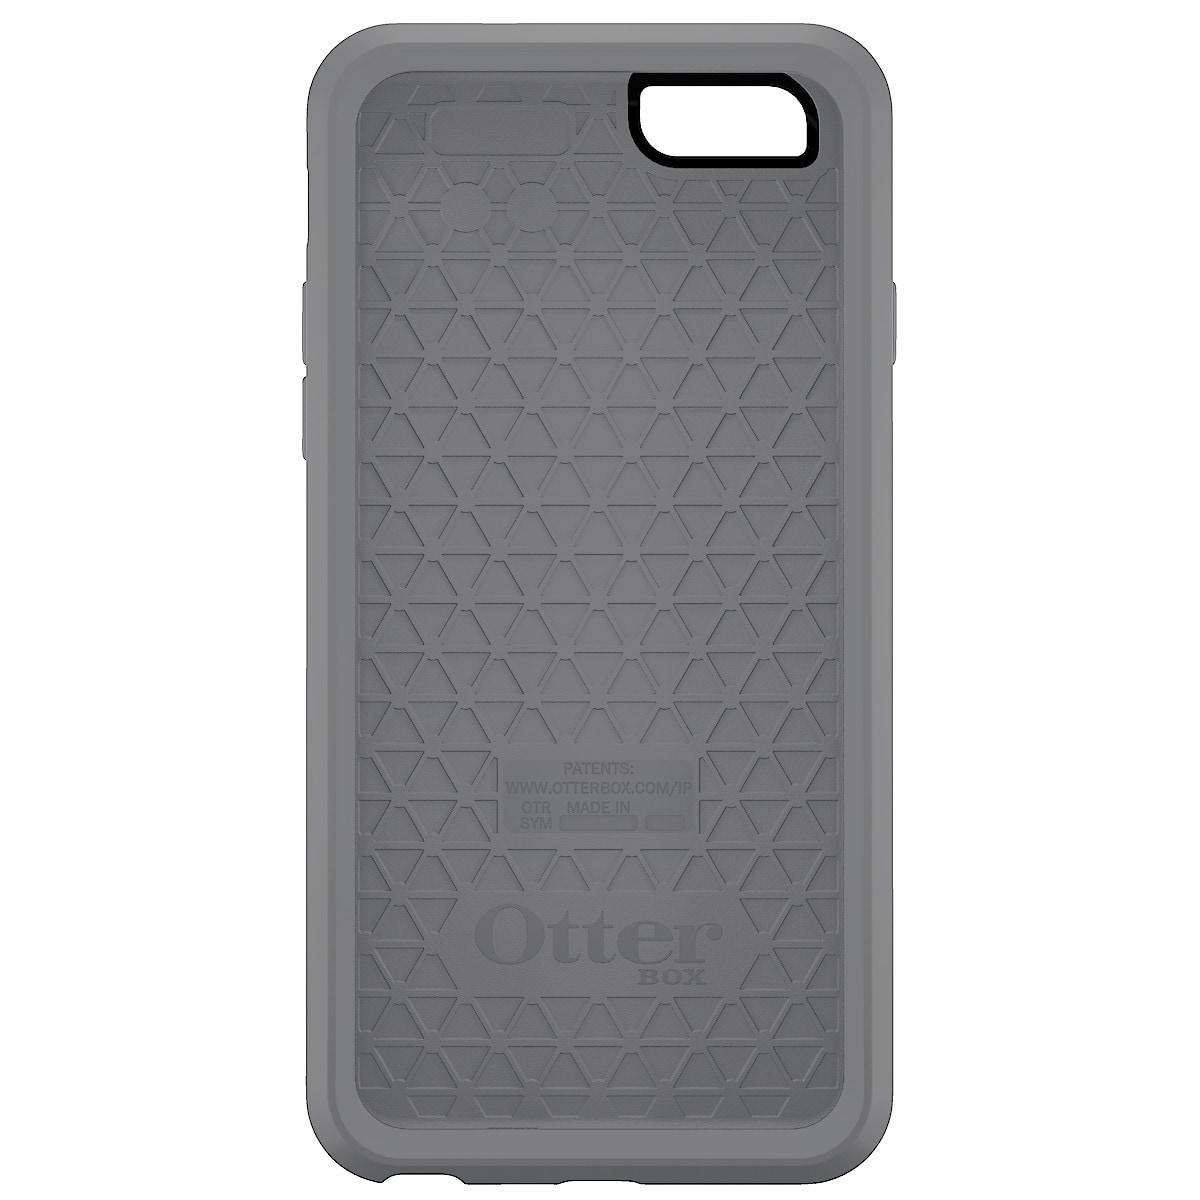 Otterbox Symmetry deksel for iPhone 6 Plus